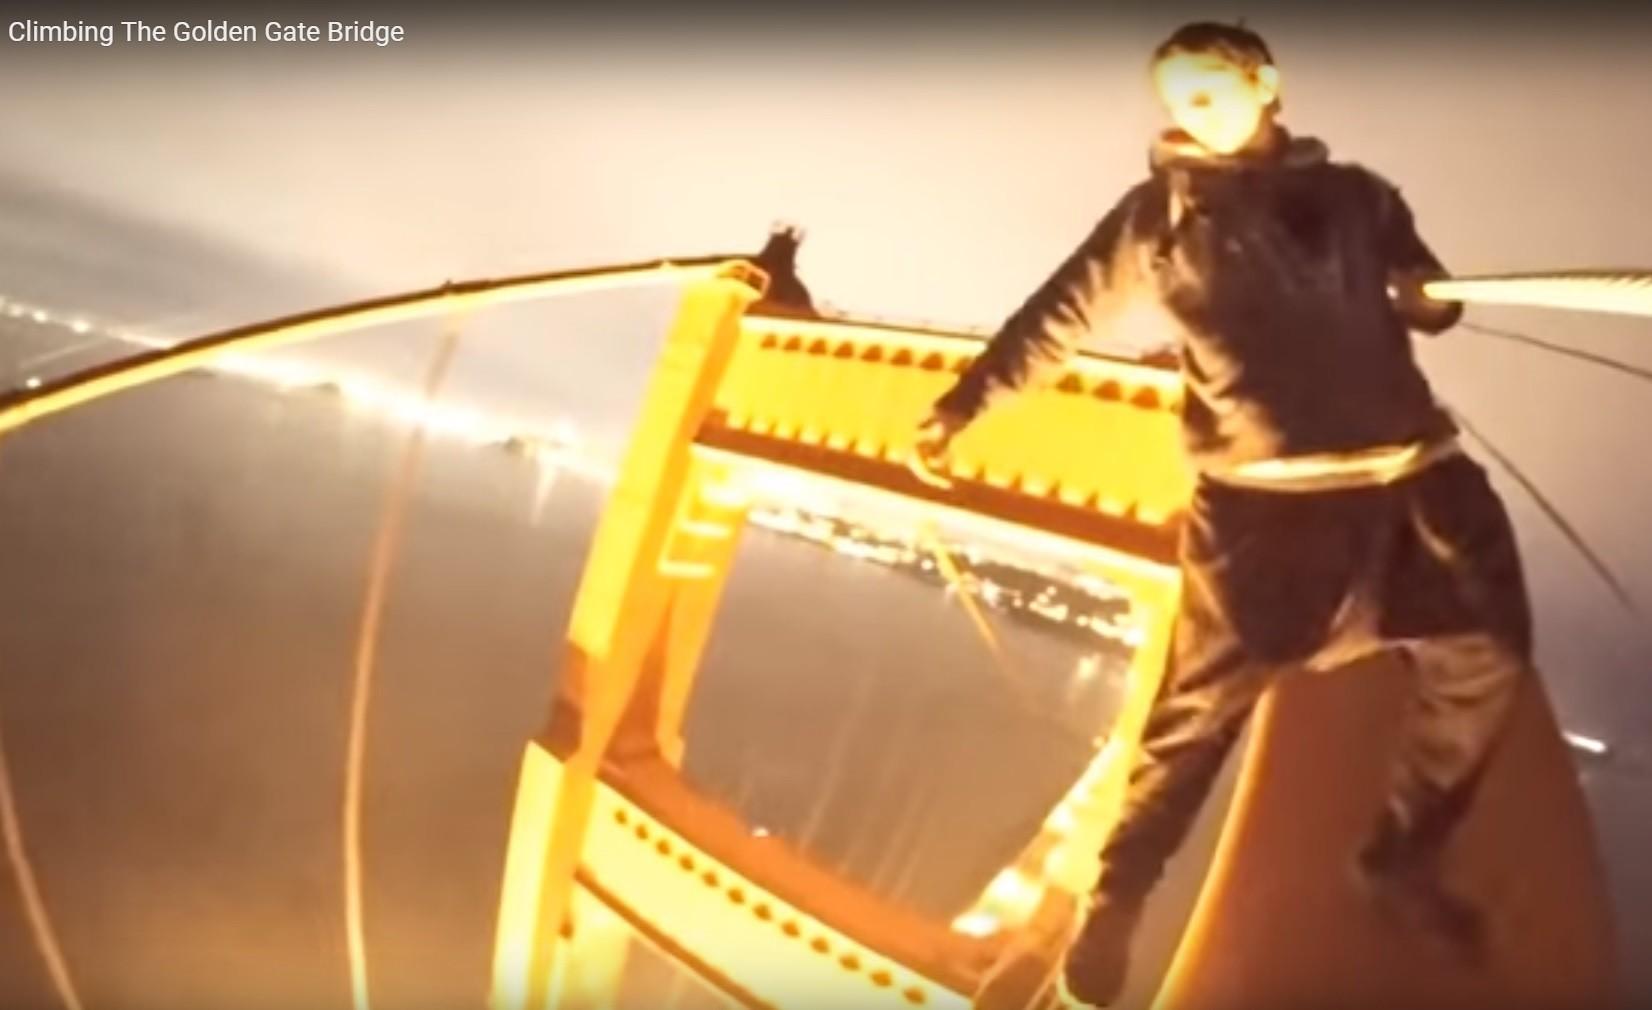 Daredevils Climb Top Of Golden Gate Bridge And Perform